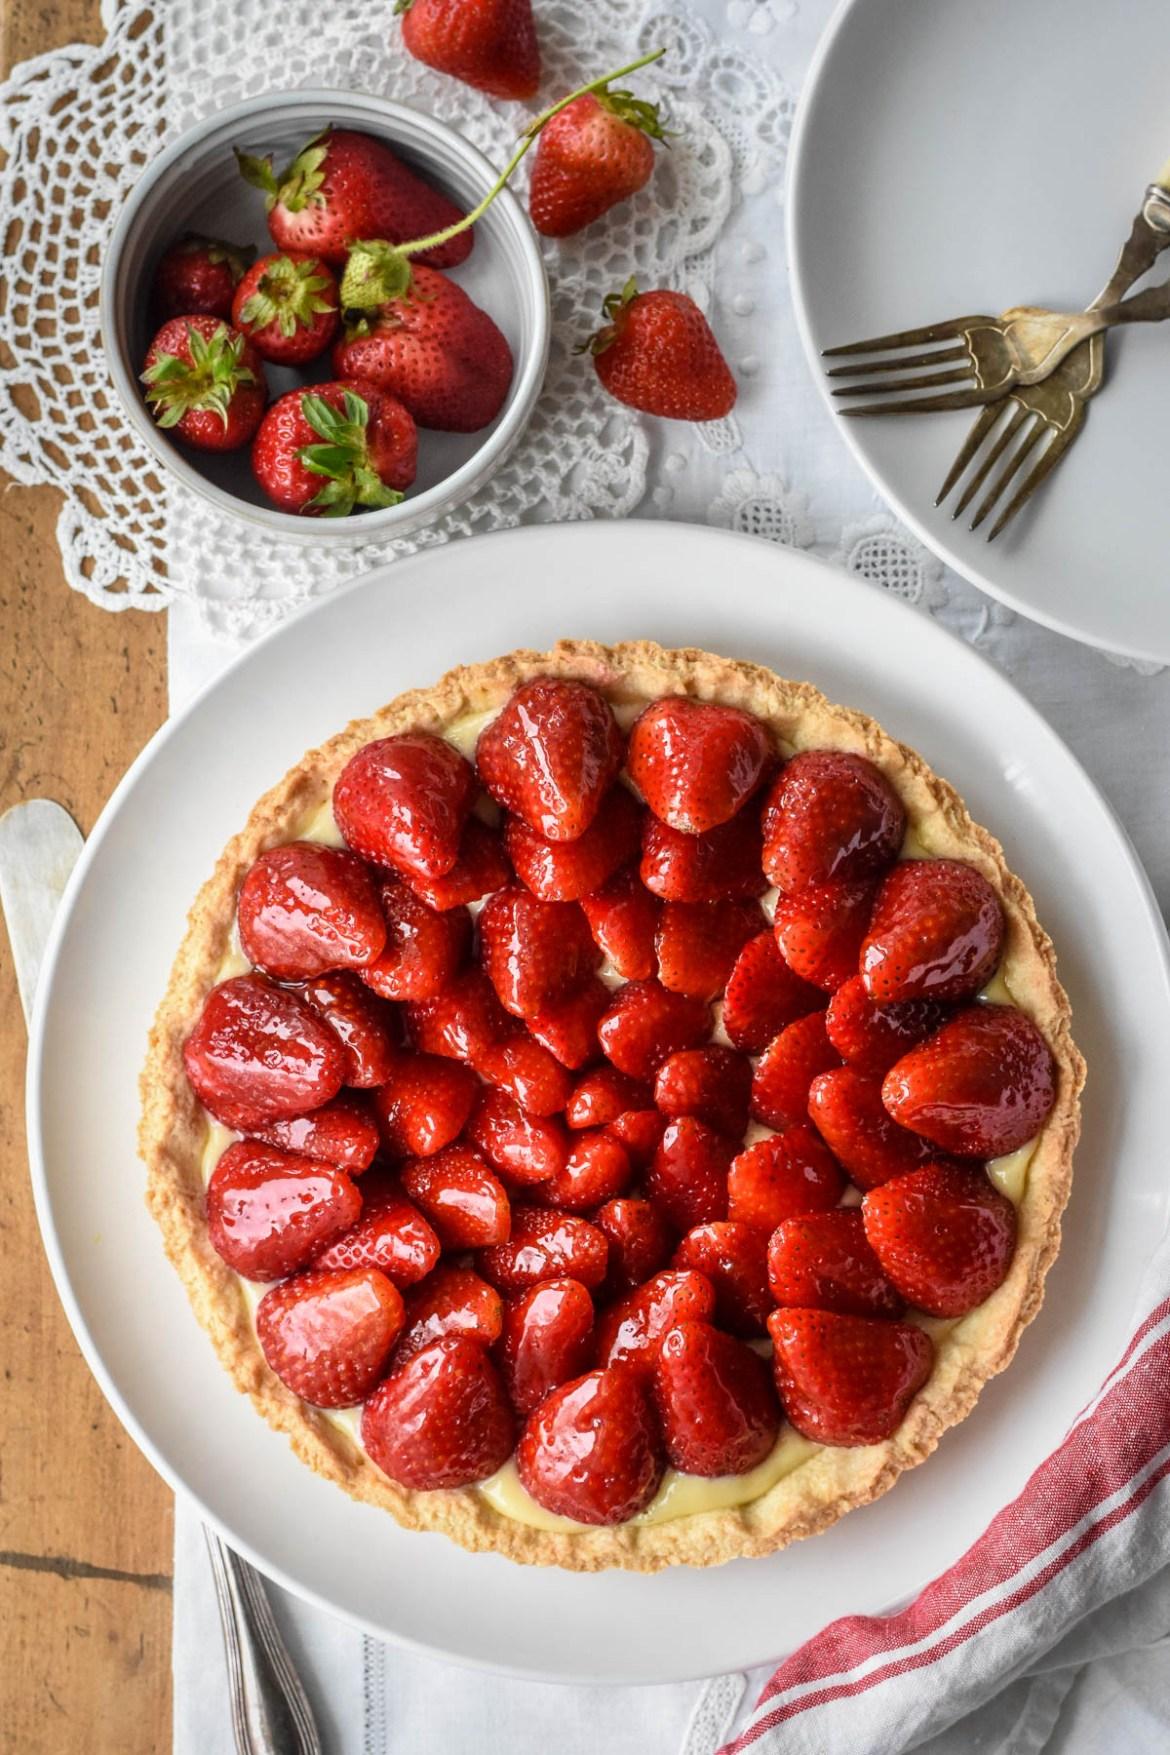 Classic French Strawberry Tart (Tarte aux Fraises)